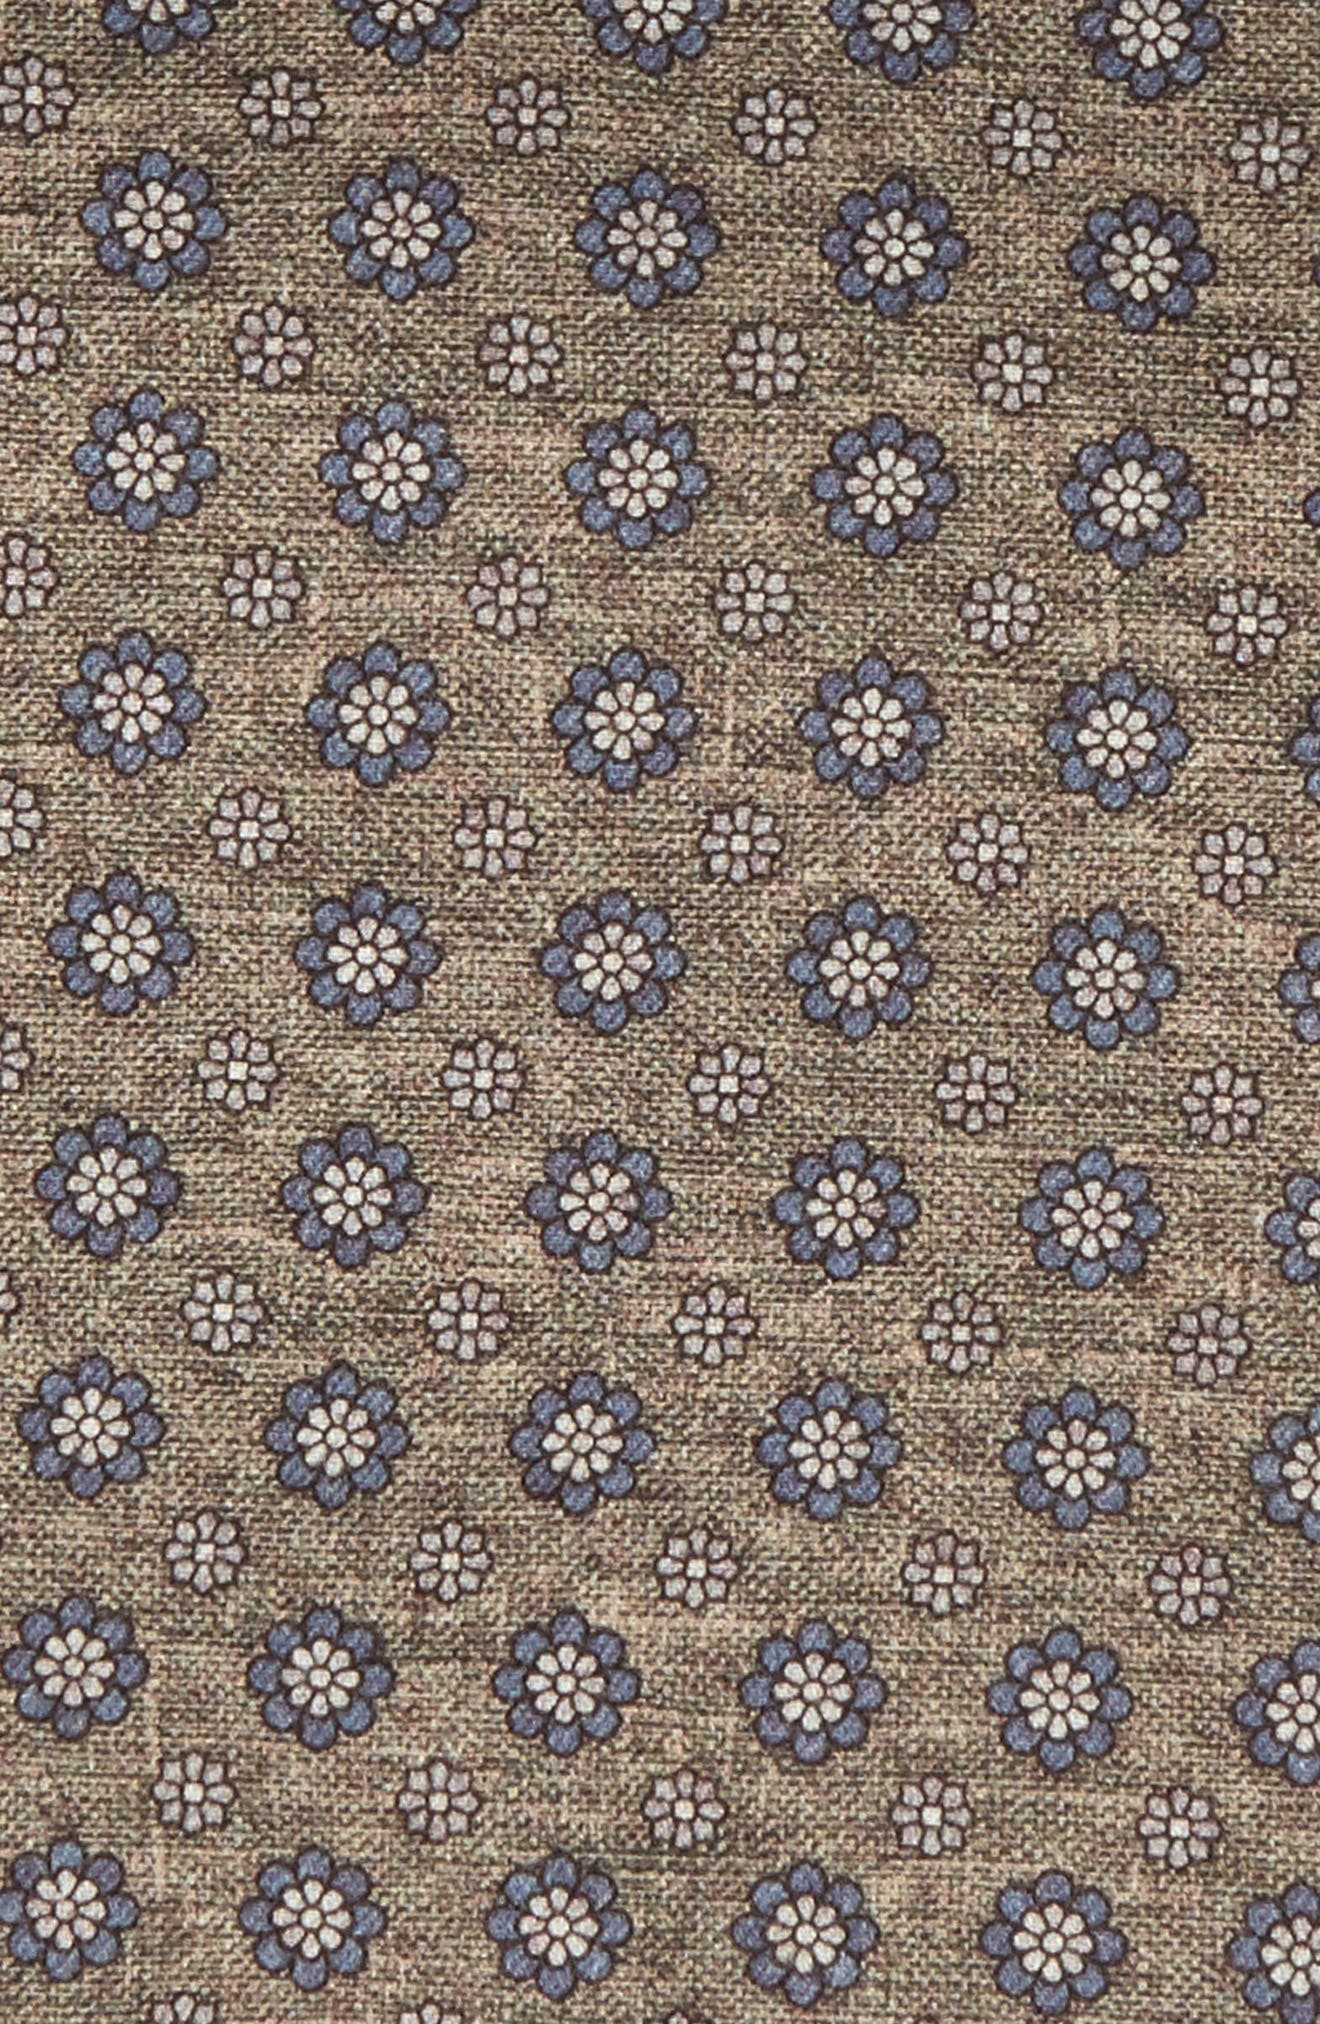 Medallion Wool & Cotton Pocket Square,                             Alternate thumbnail 3, color,                             328